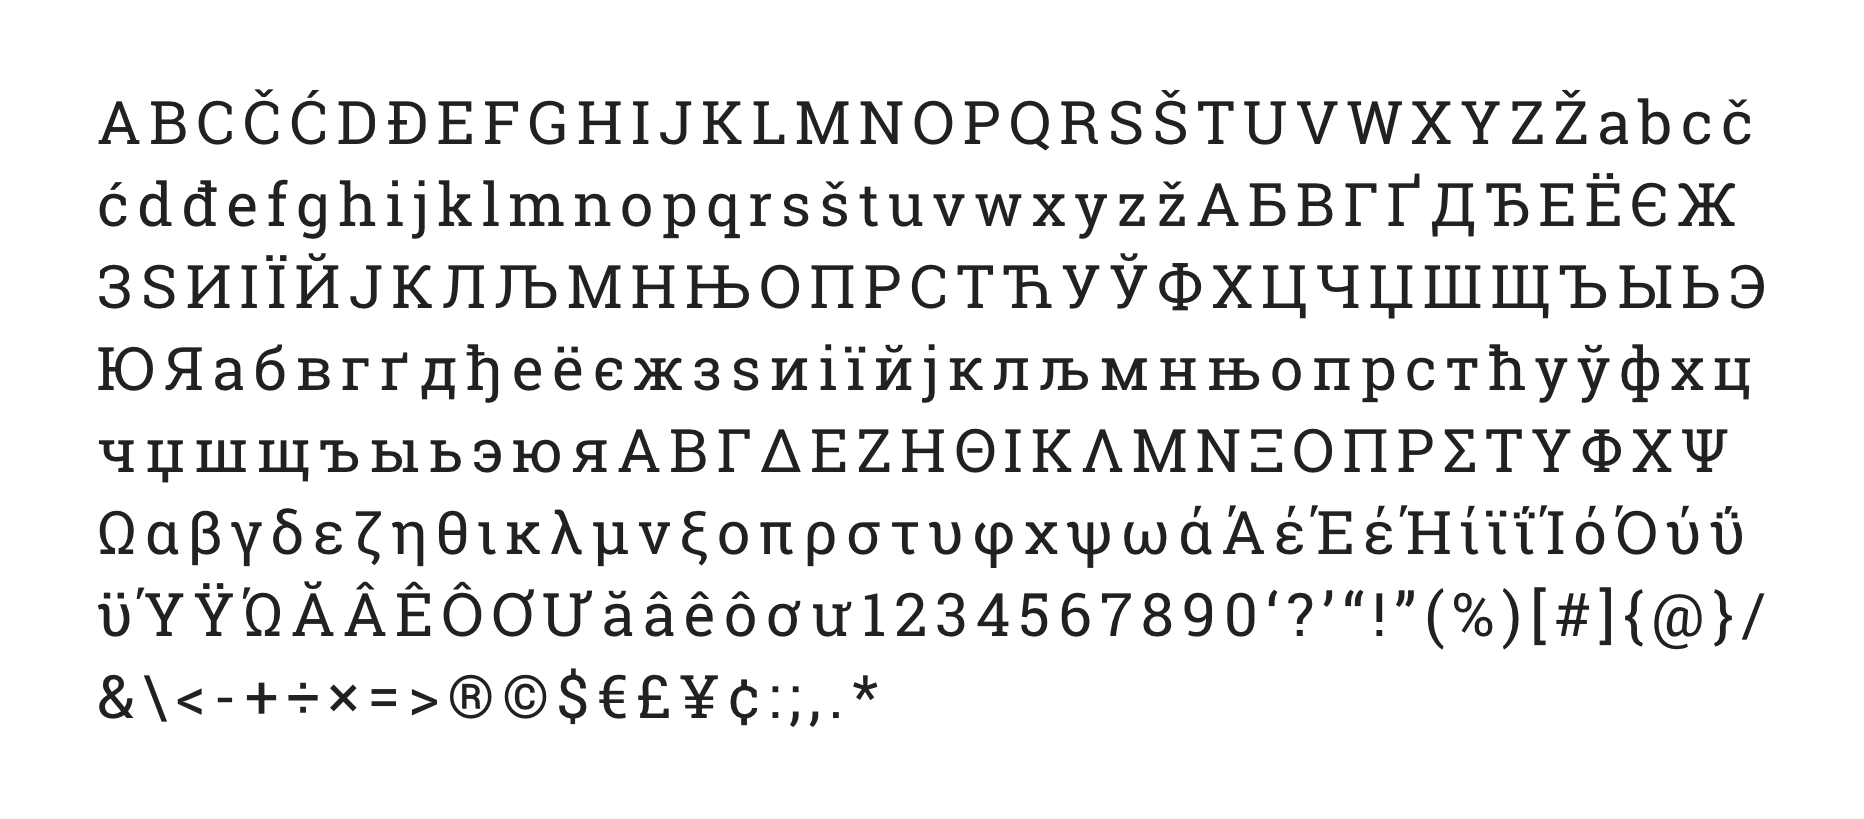 Fonts - Branding - Marketing Communications - Seattle University